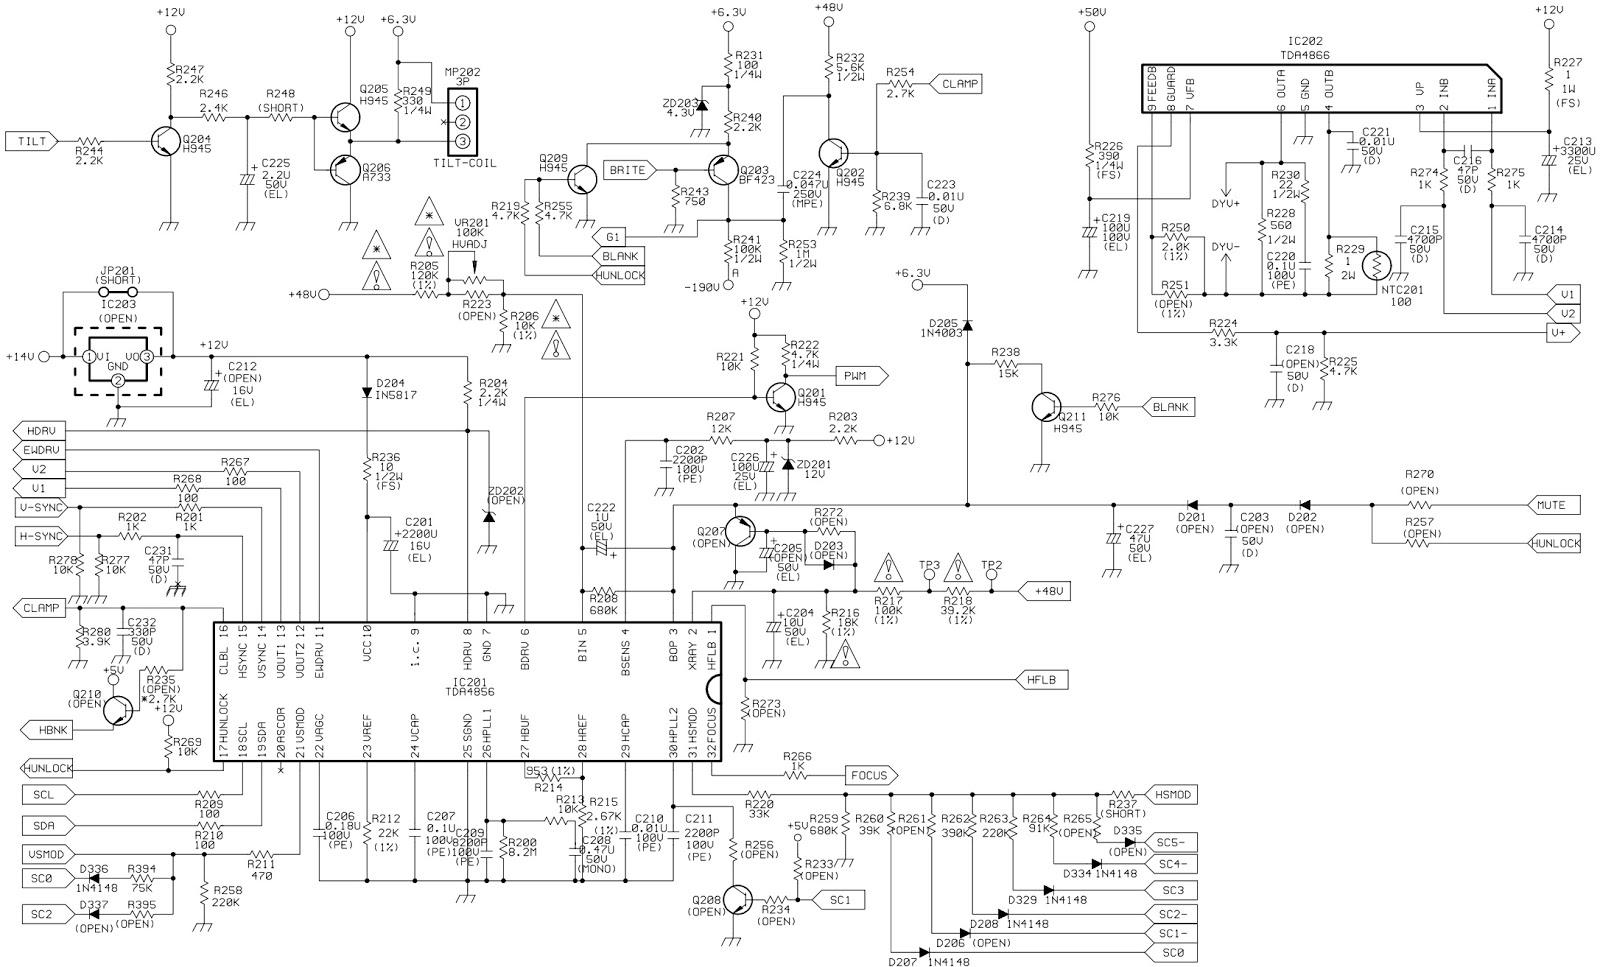 BenQ, Mitsubishi 1786FD2 Diamond View CRT Monitor – Circuit Diagram  Adjustments